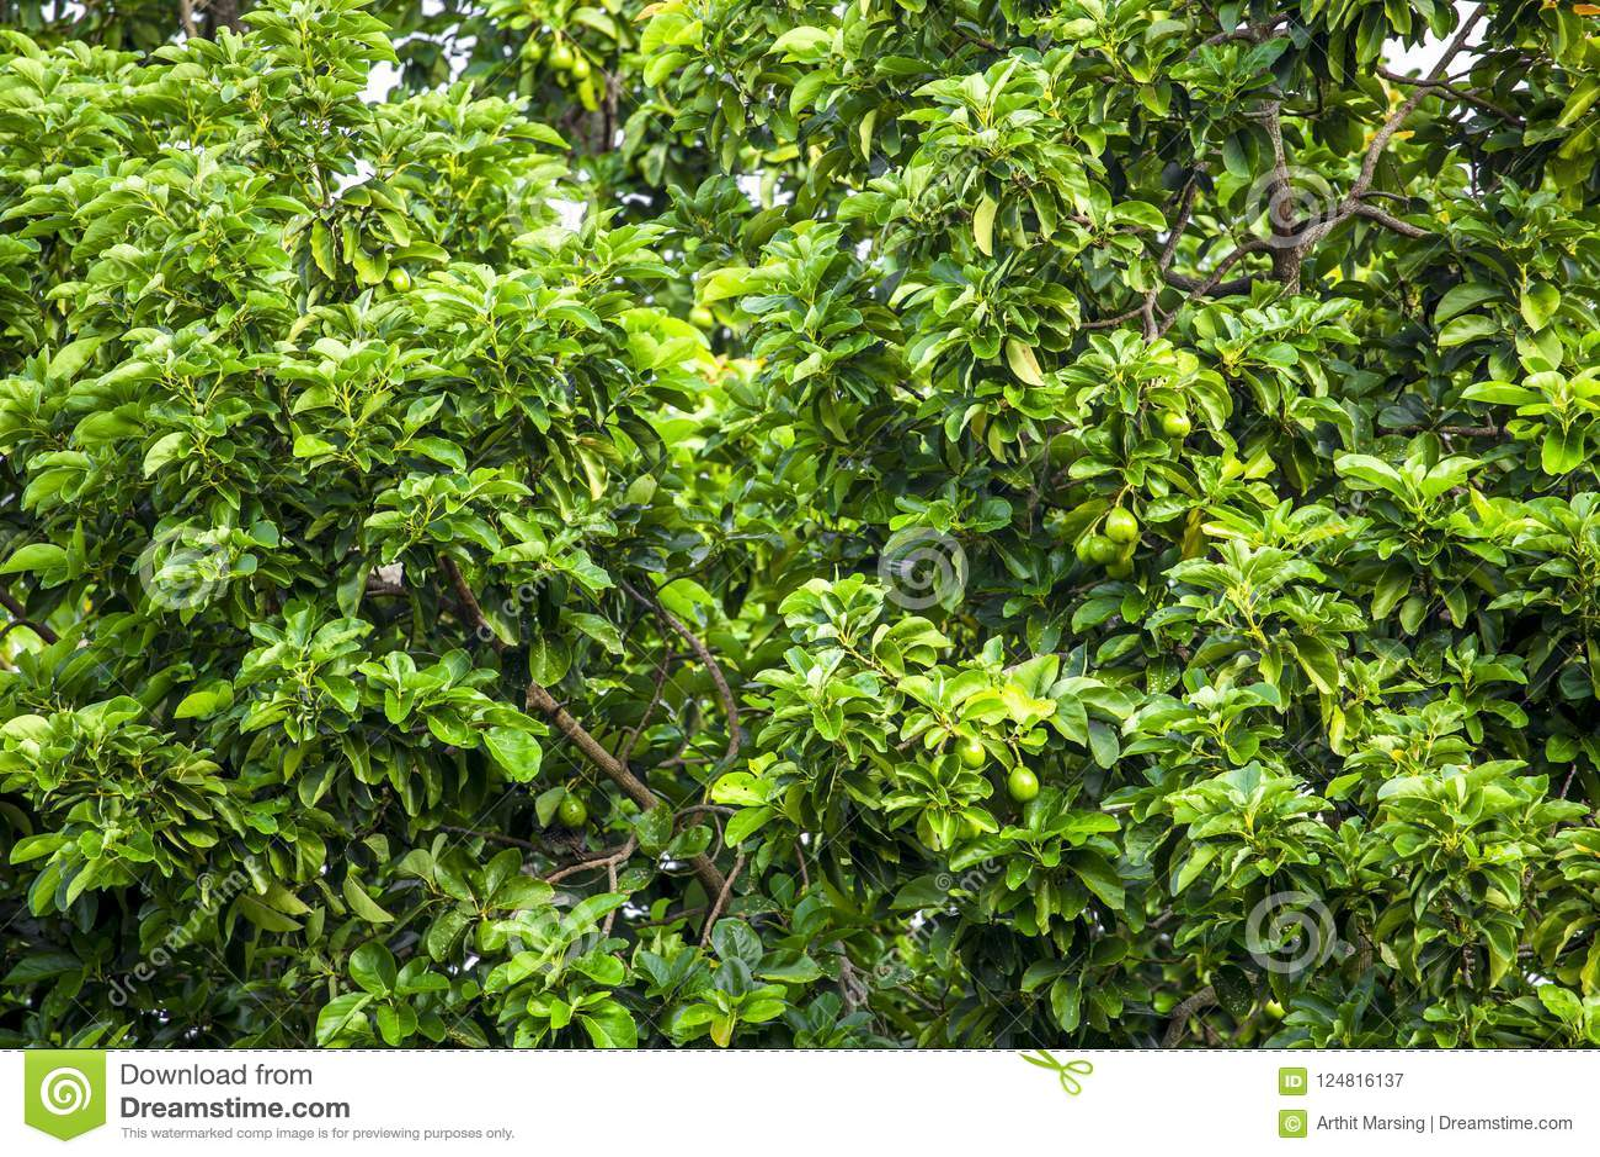 le persea d'avocat americana est un arbre qui est indigène au